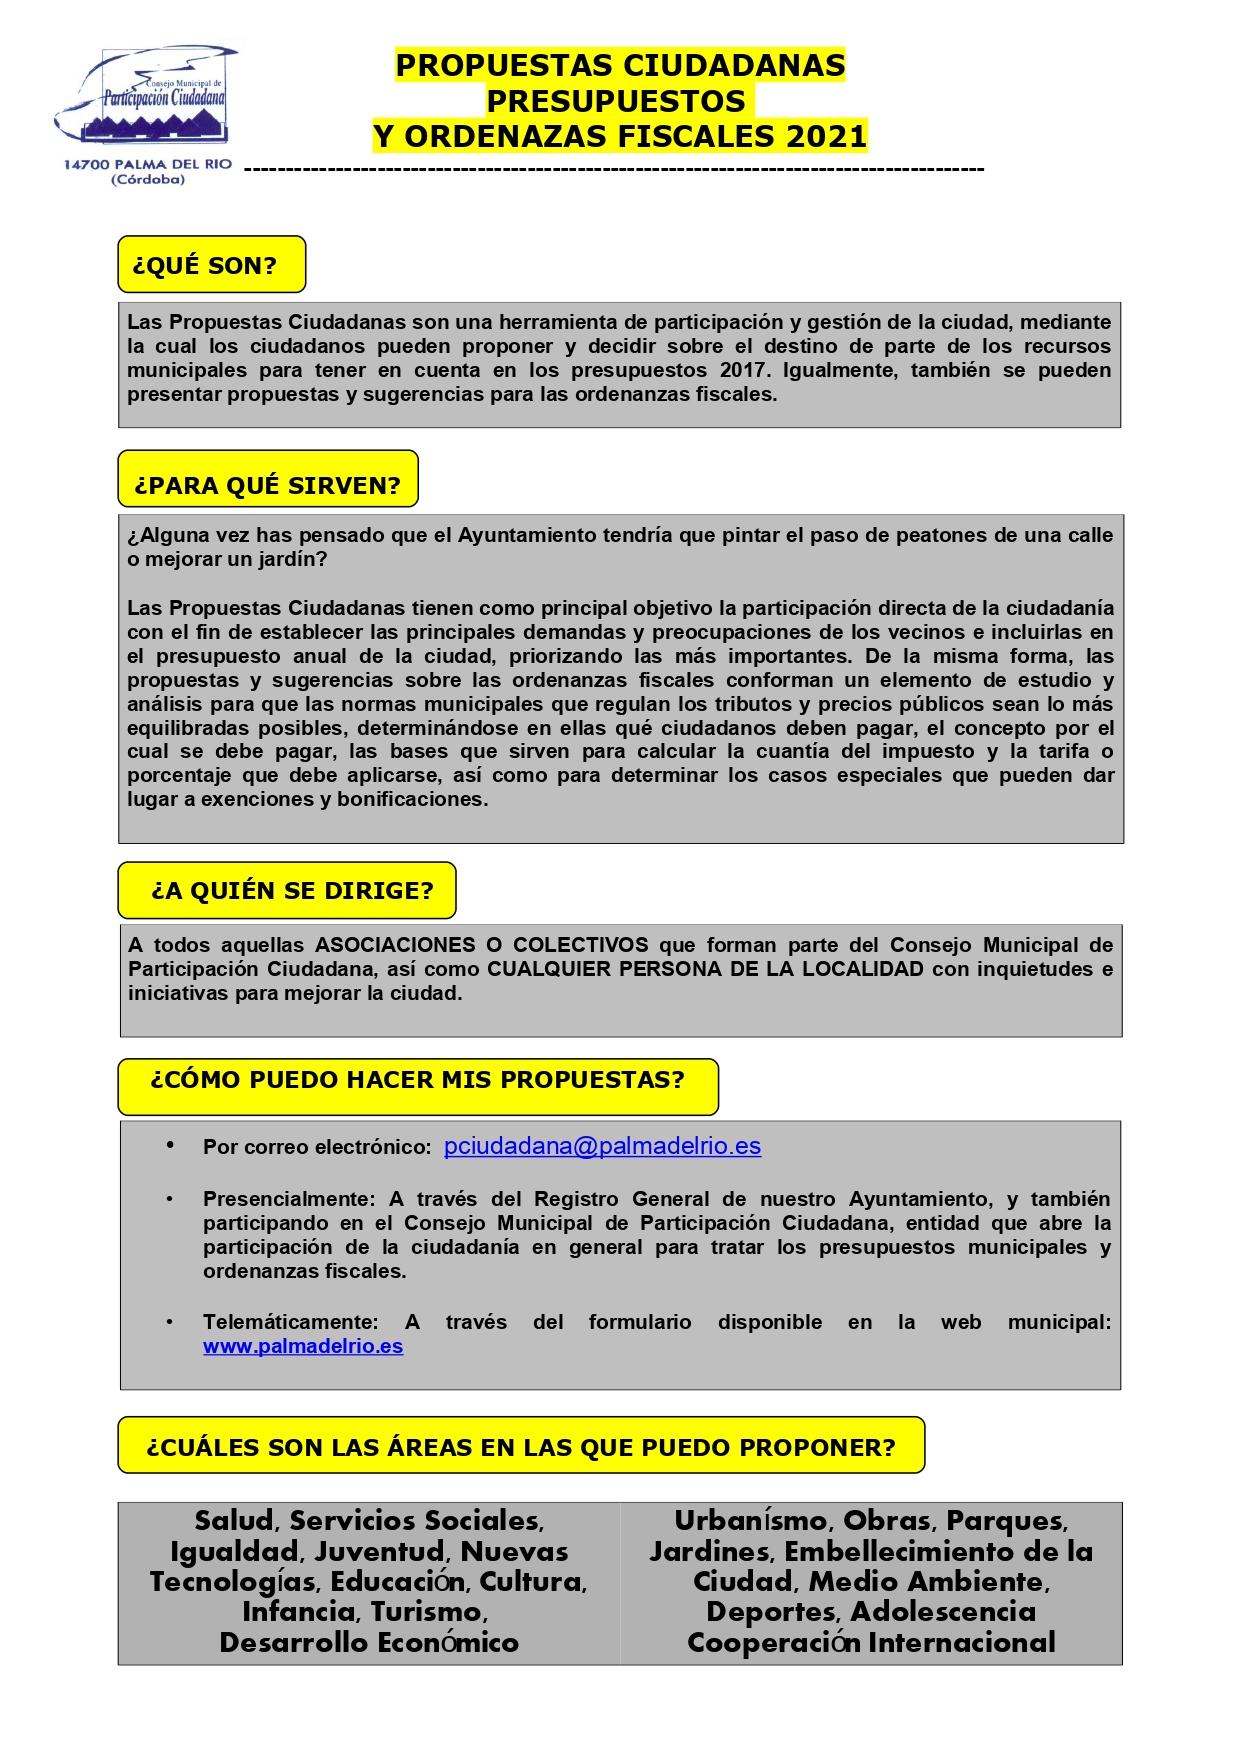 https://www.palmadelrio.es/sites/default/files/herramienta.propuestas_ciudadanas_2021_page-0001.jpg